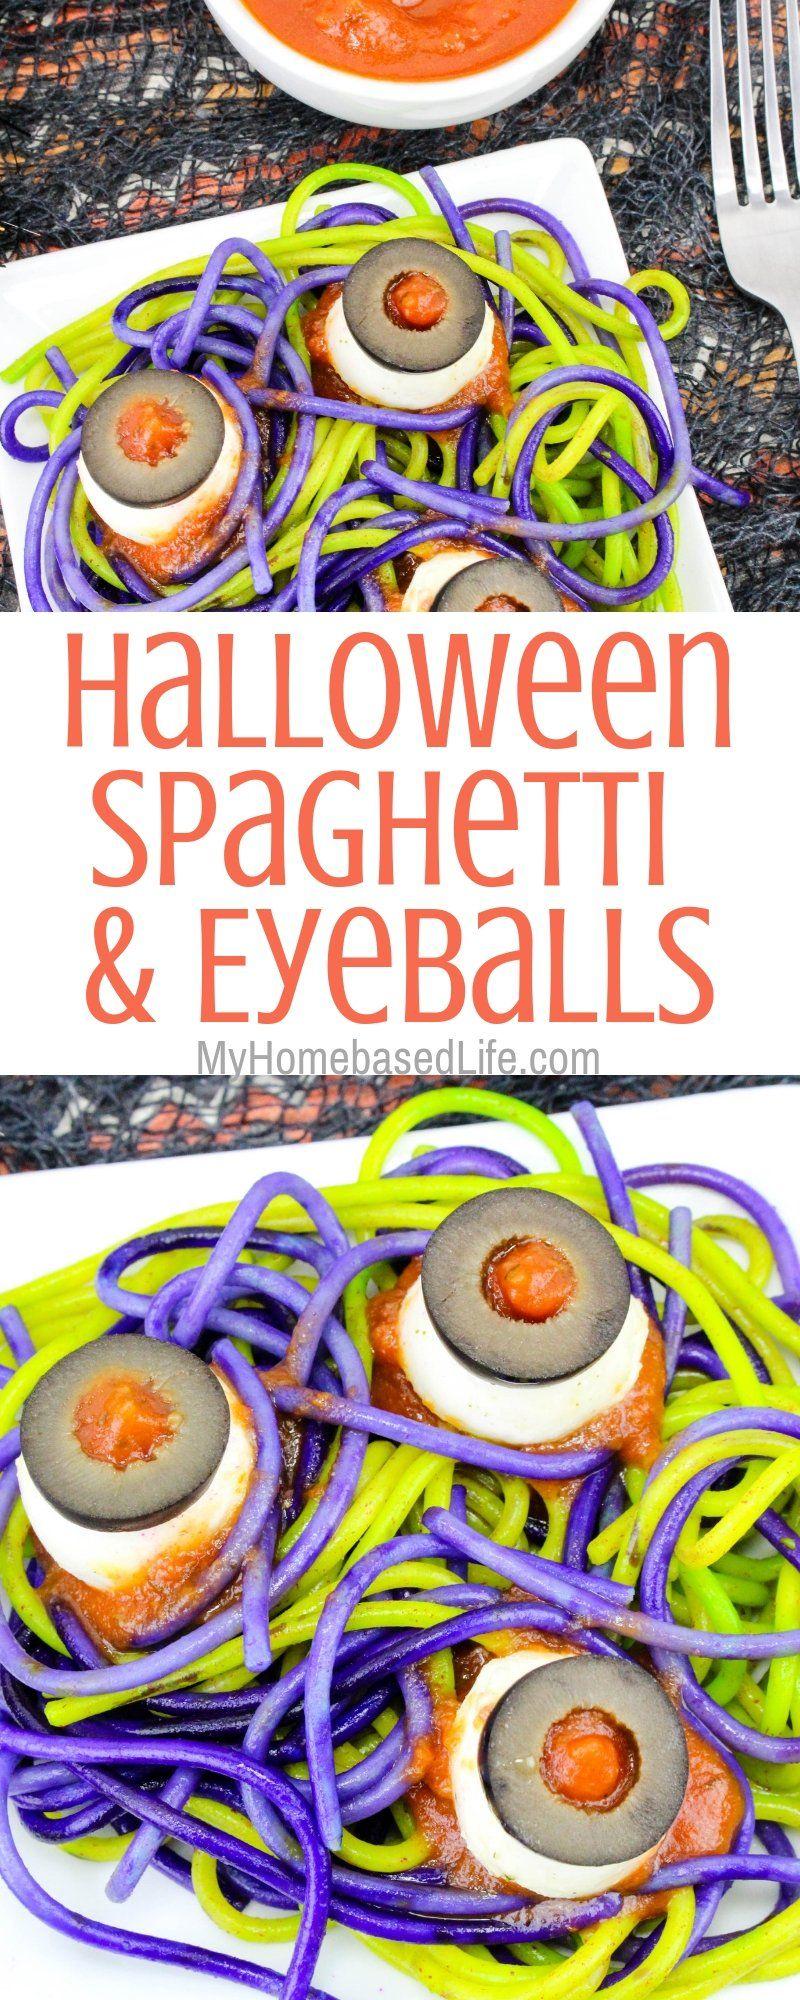 Spaghetti and Eyeballs Recipe   My Home Based Life